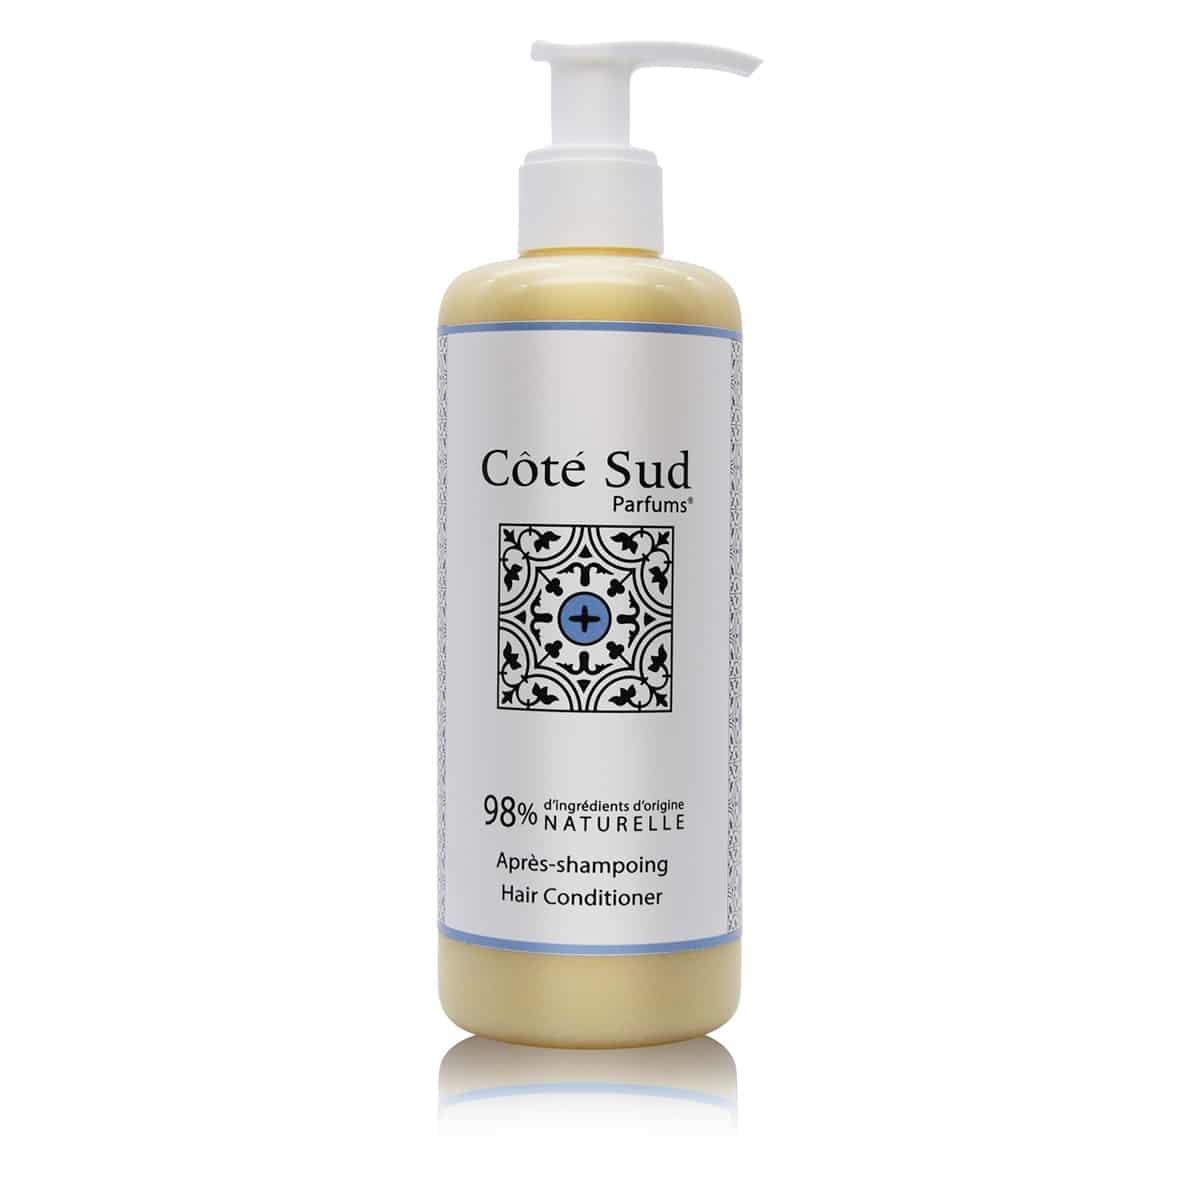 Côté Sud Bio Hair Conditioner